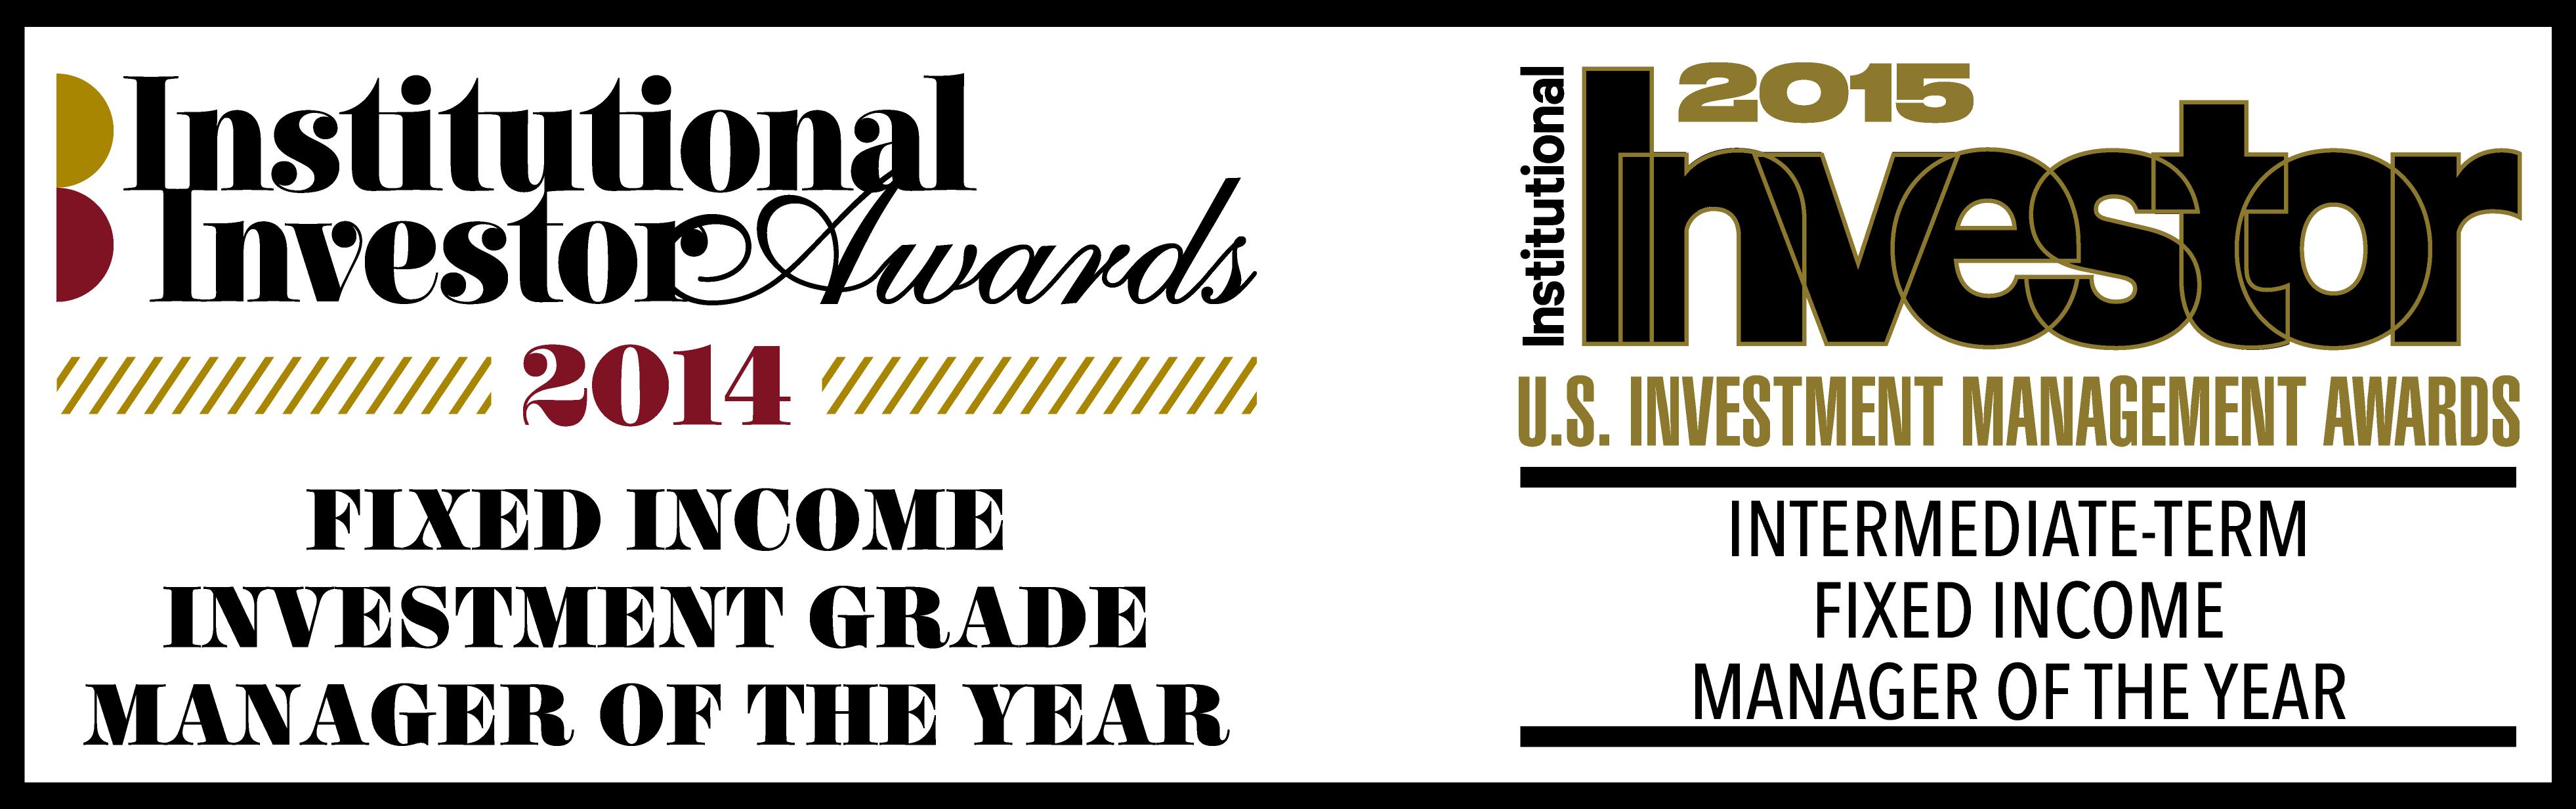 Institutional Investor Awards